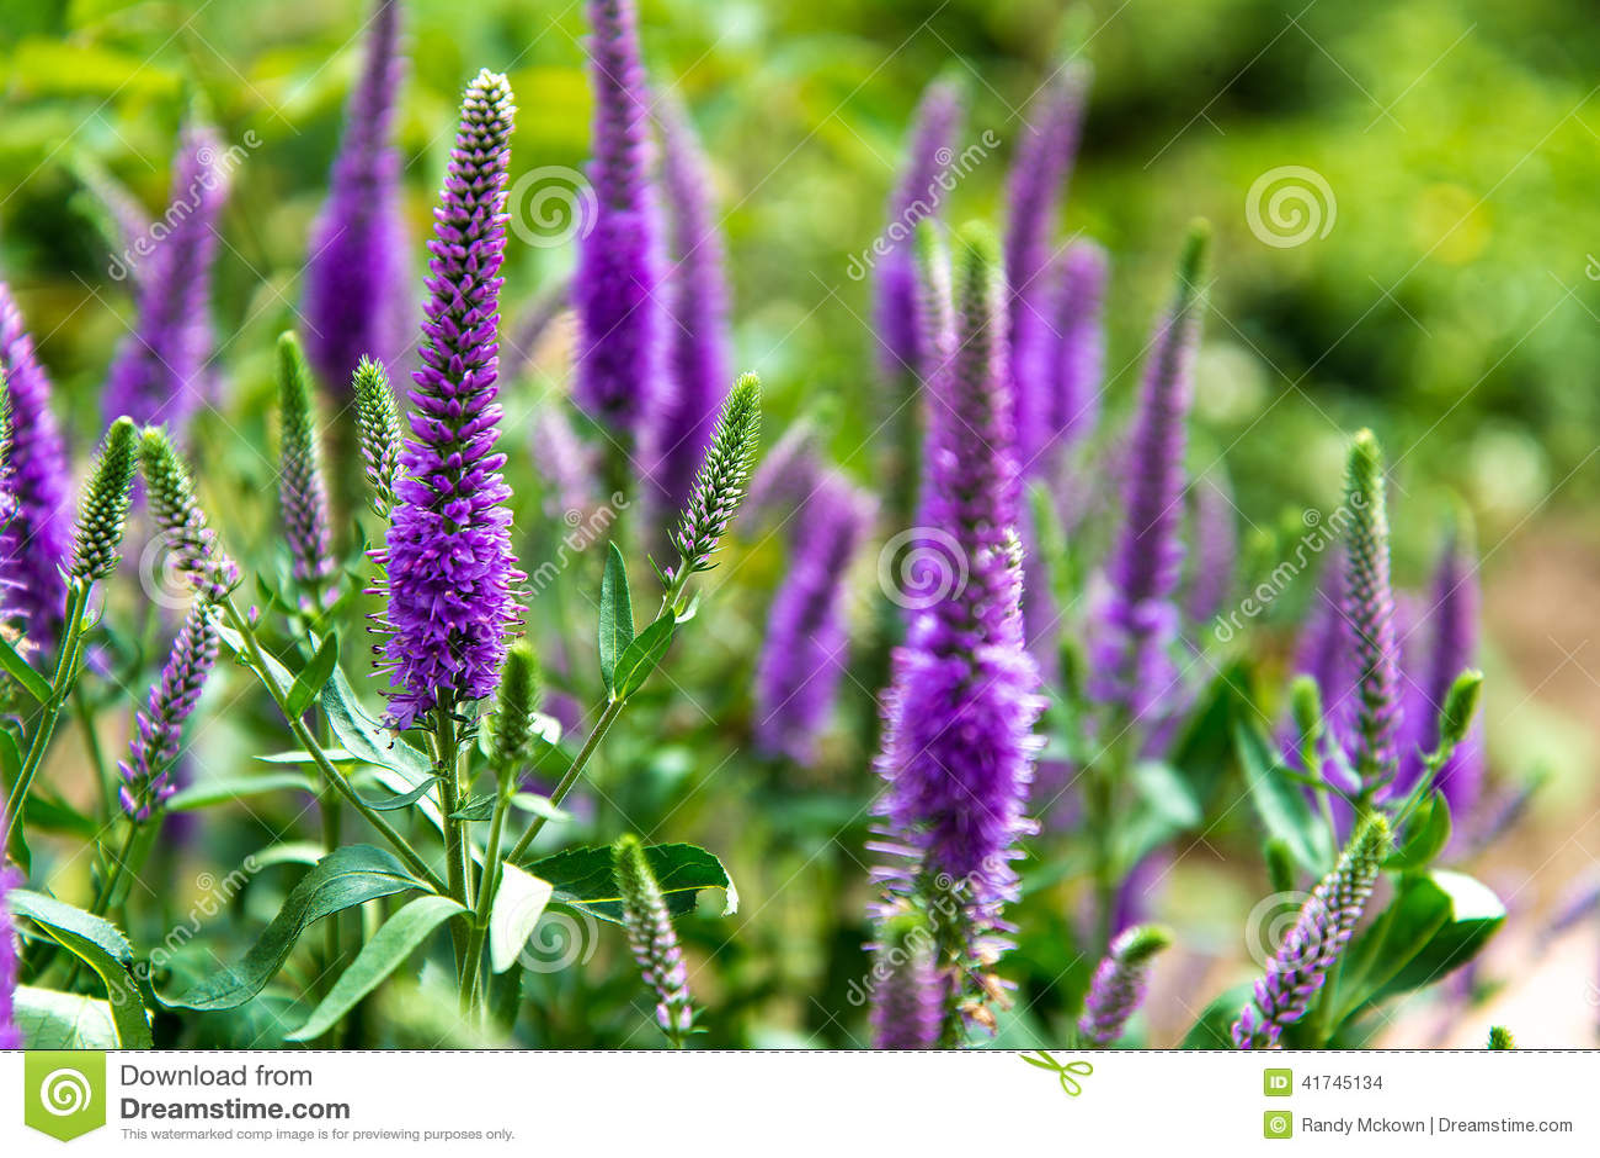 Purple Flowered Perennials Images Fresh Lotus Flowers